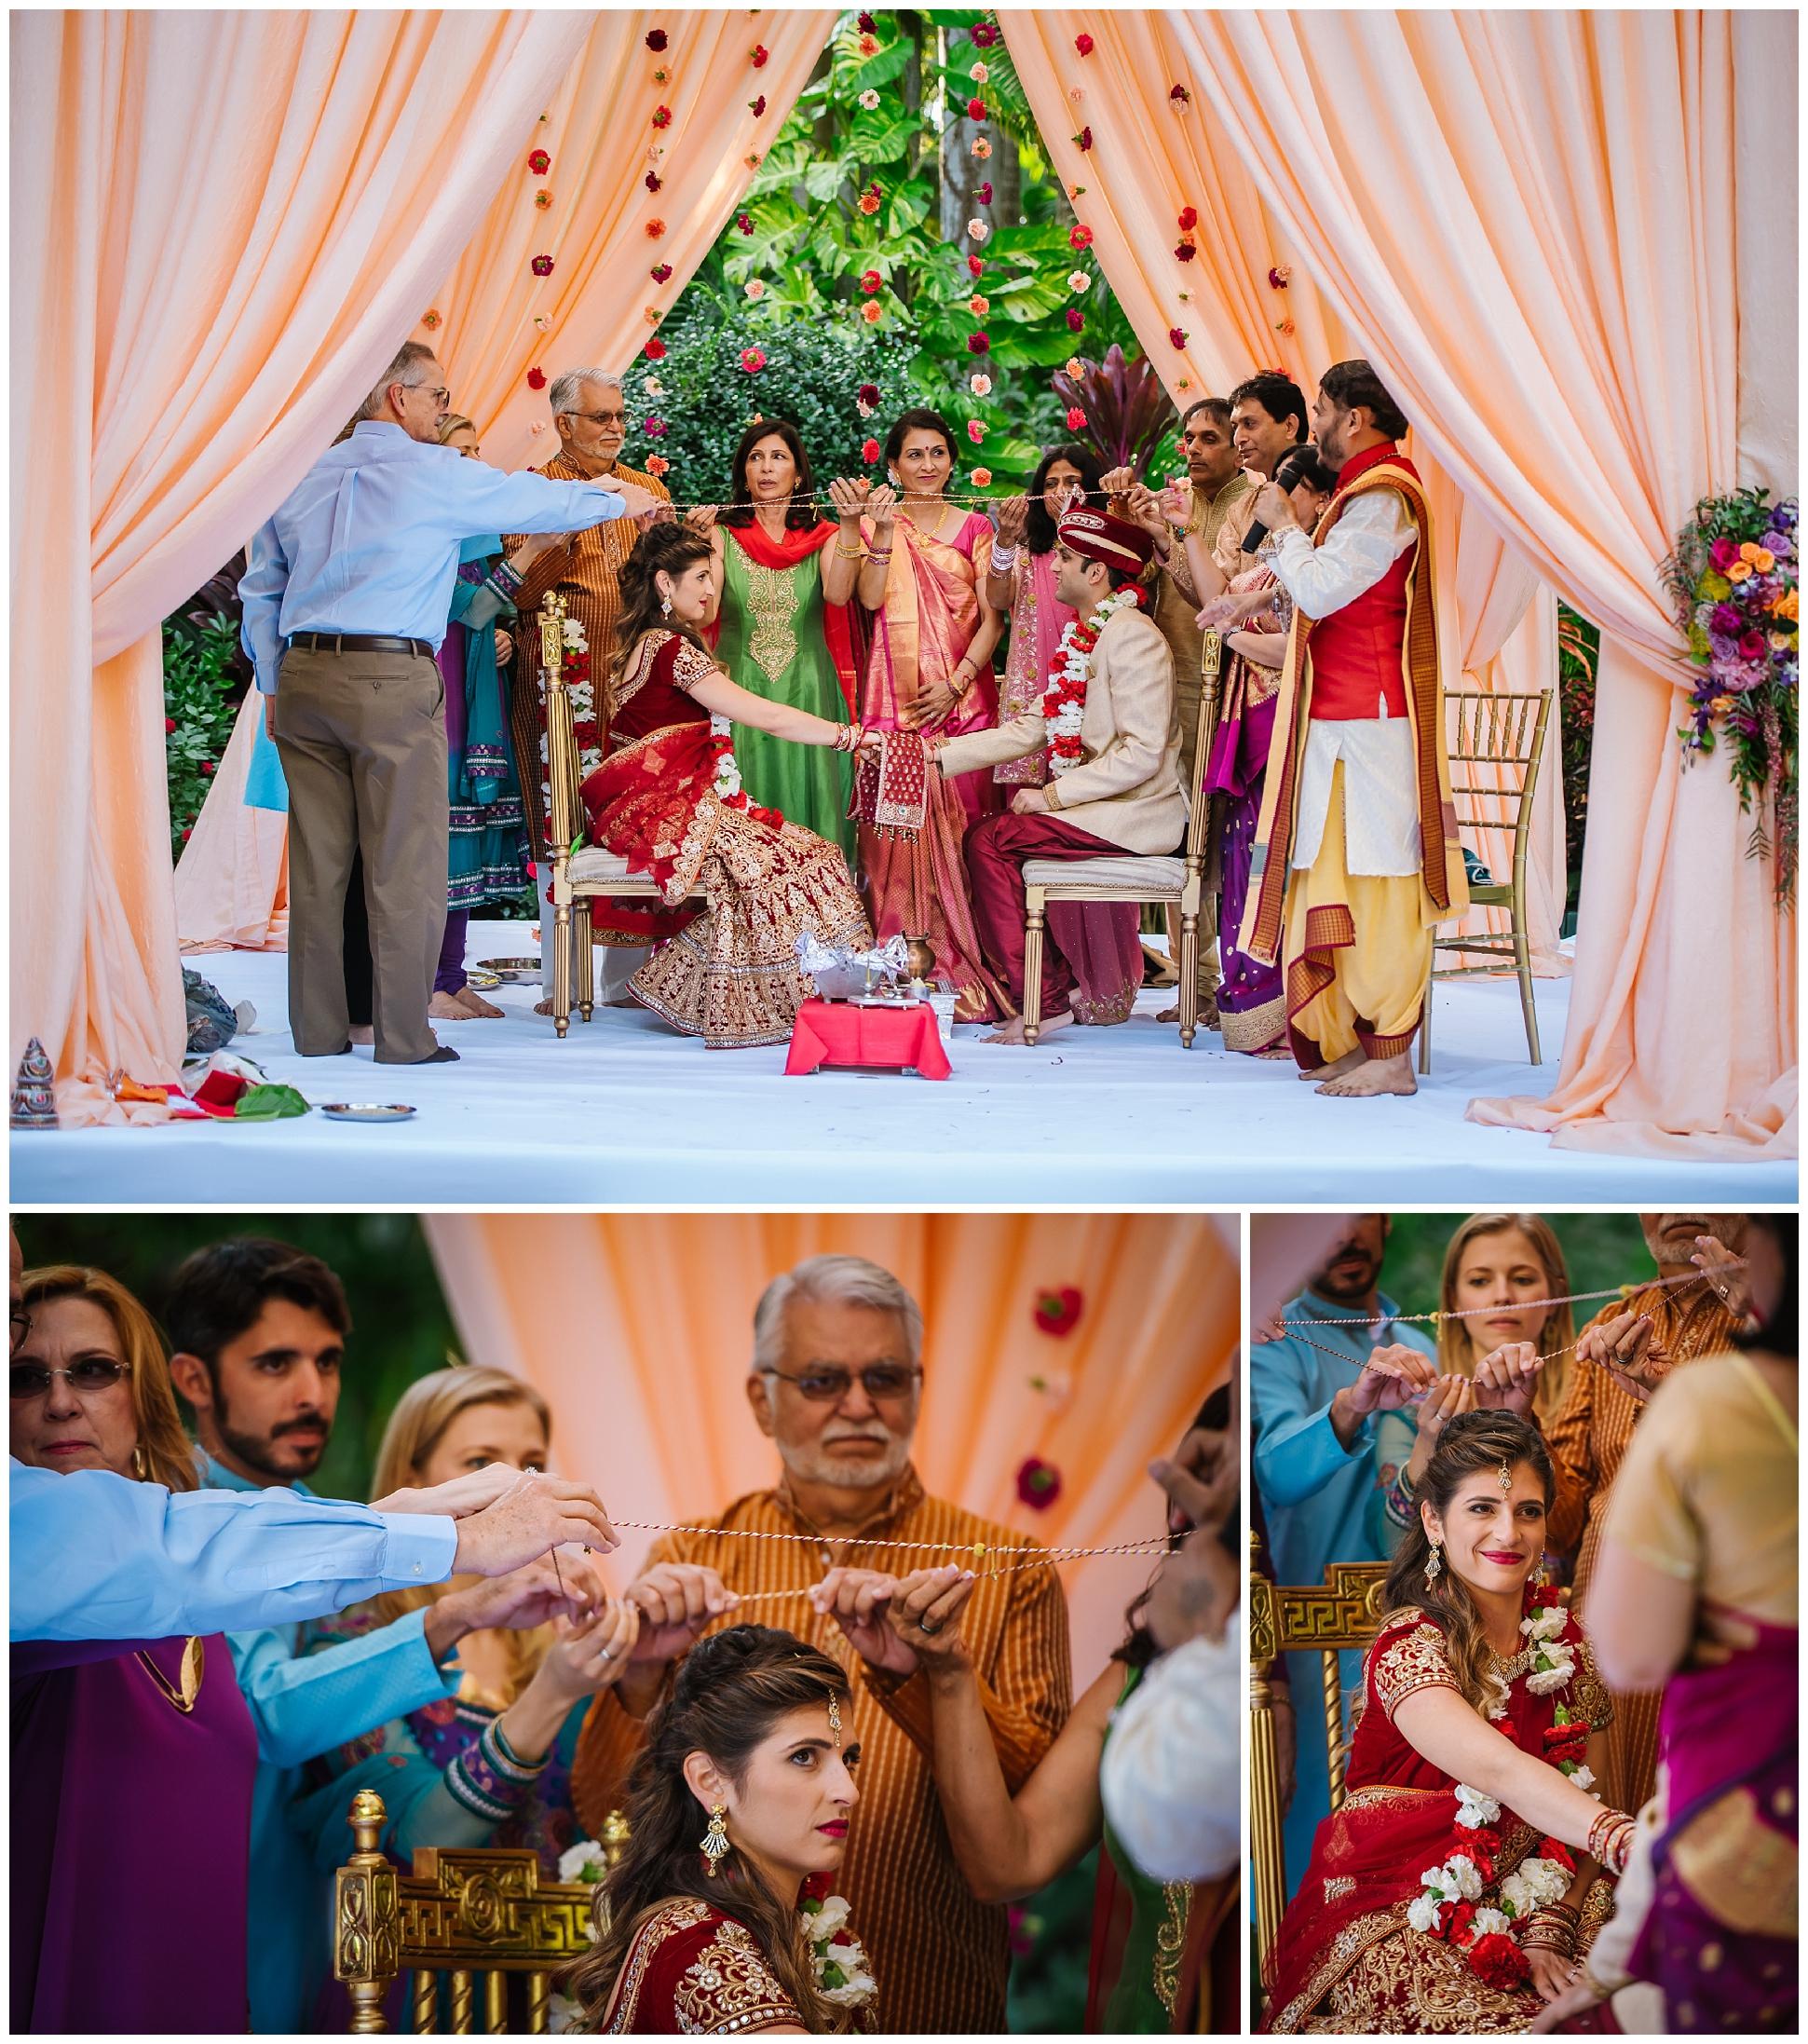 St-pete-indian-wedding-photographer-barat-sunken-gardens_0115.jpg